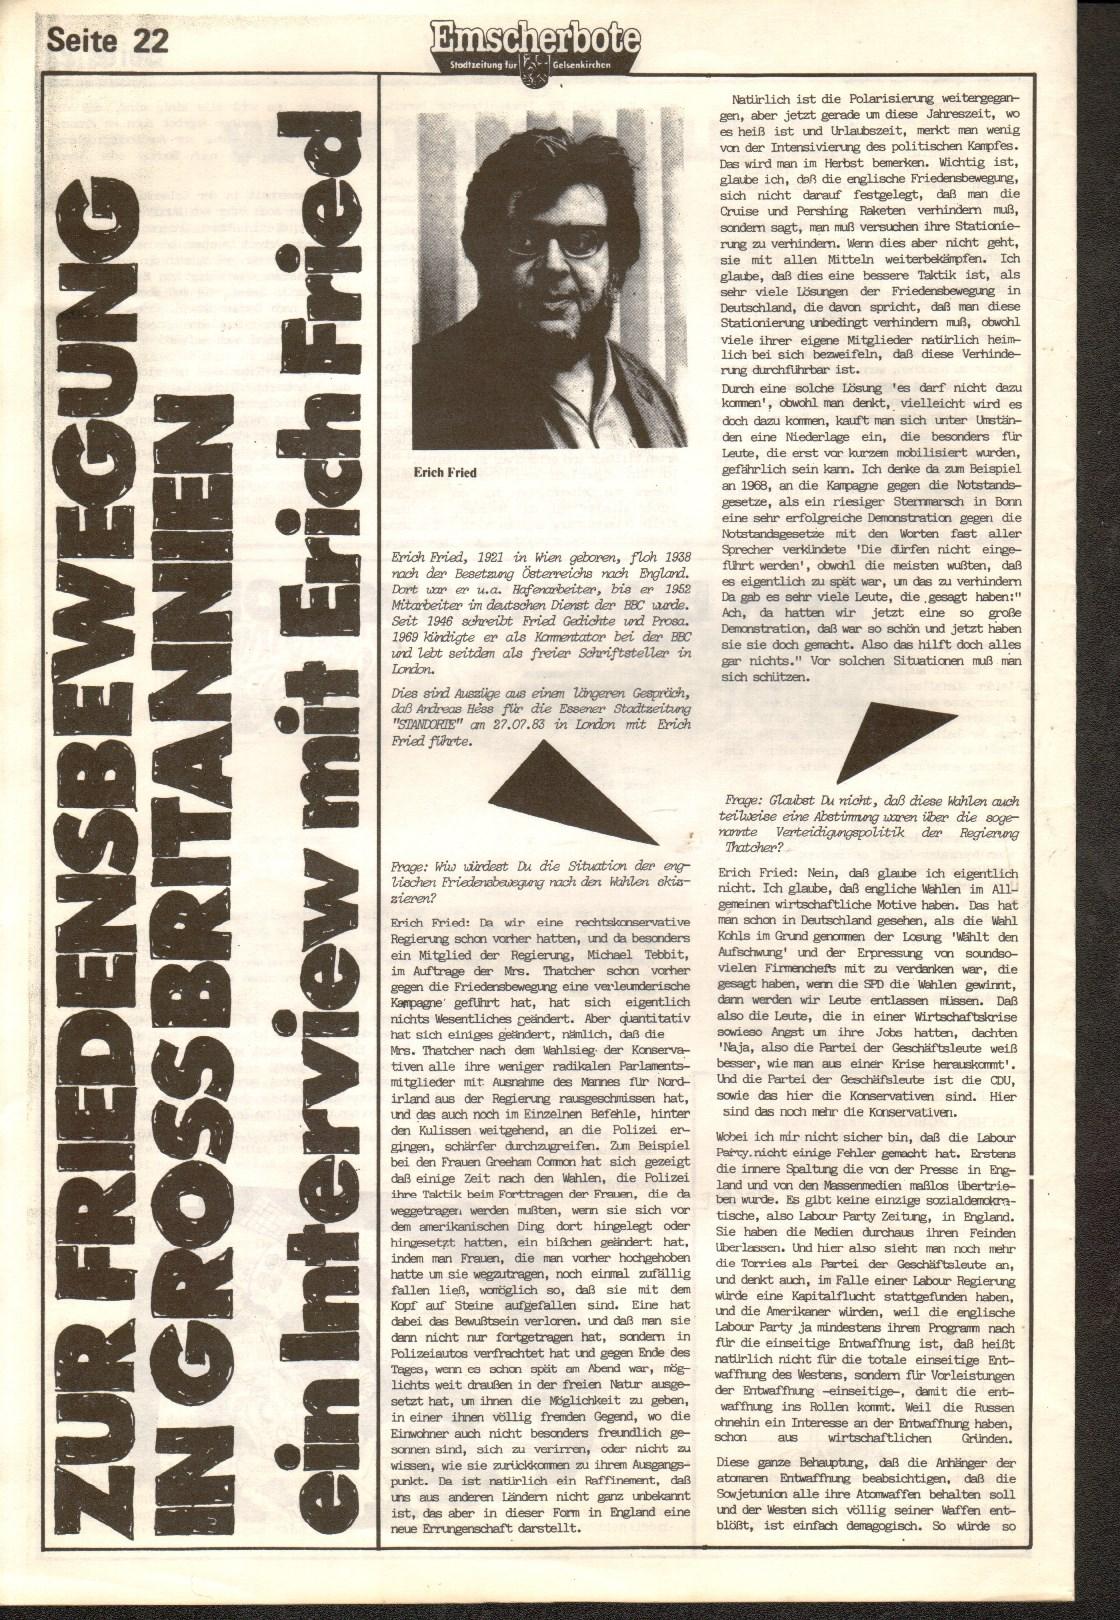 Gelsenkirchen_Emscherbote_1983_31_22